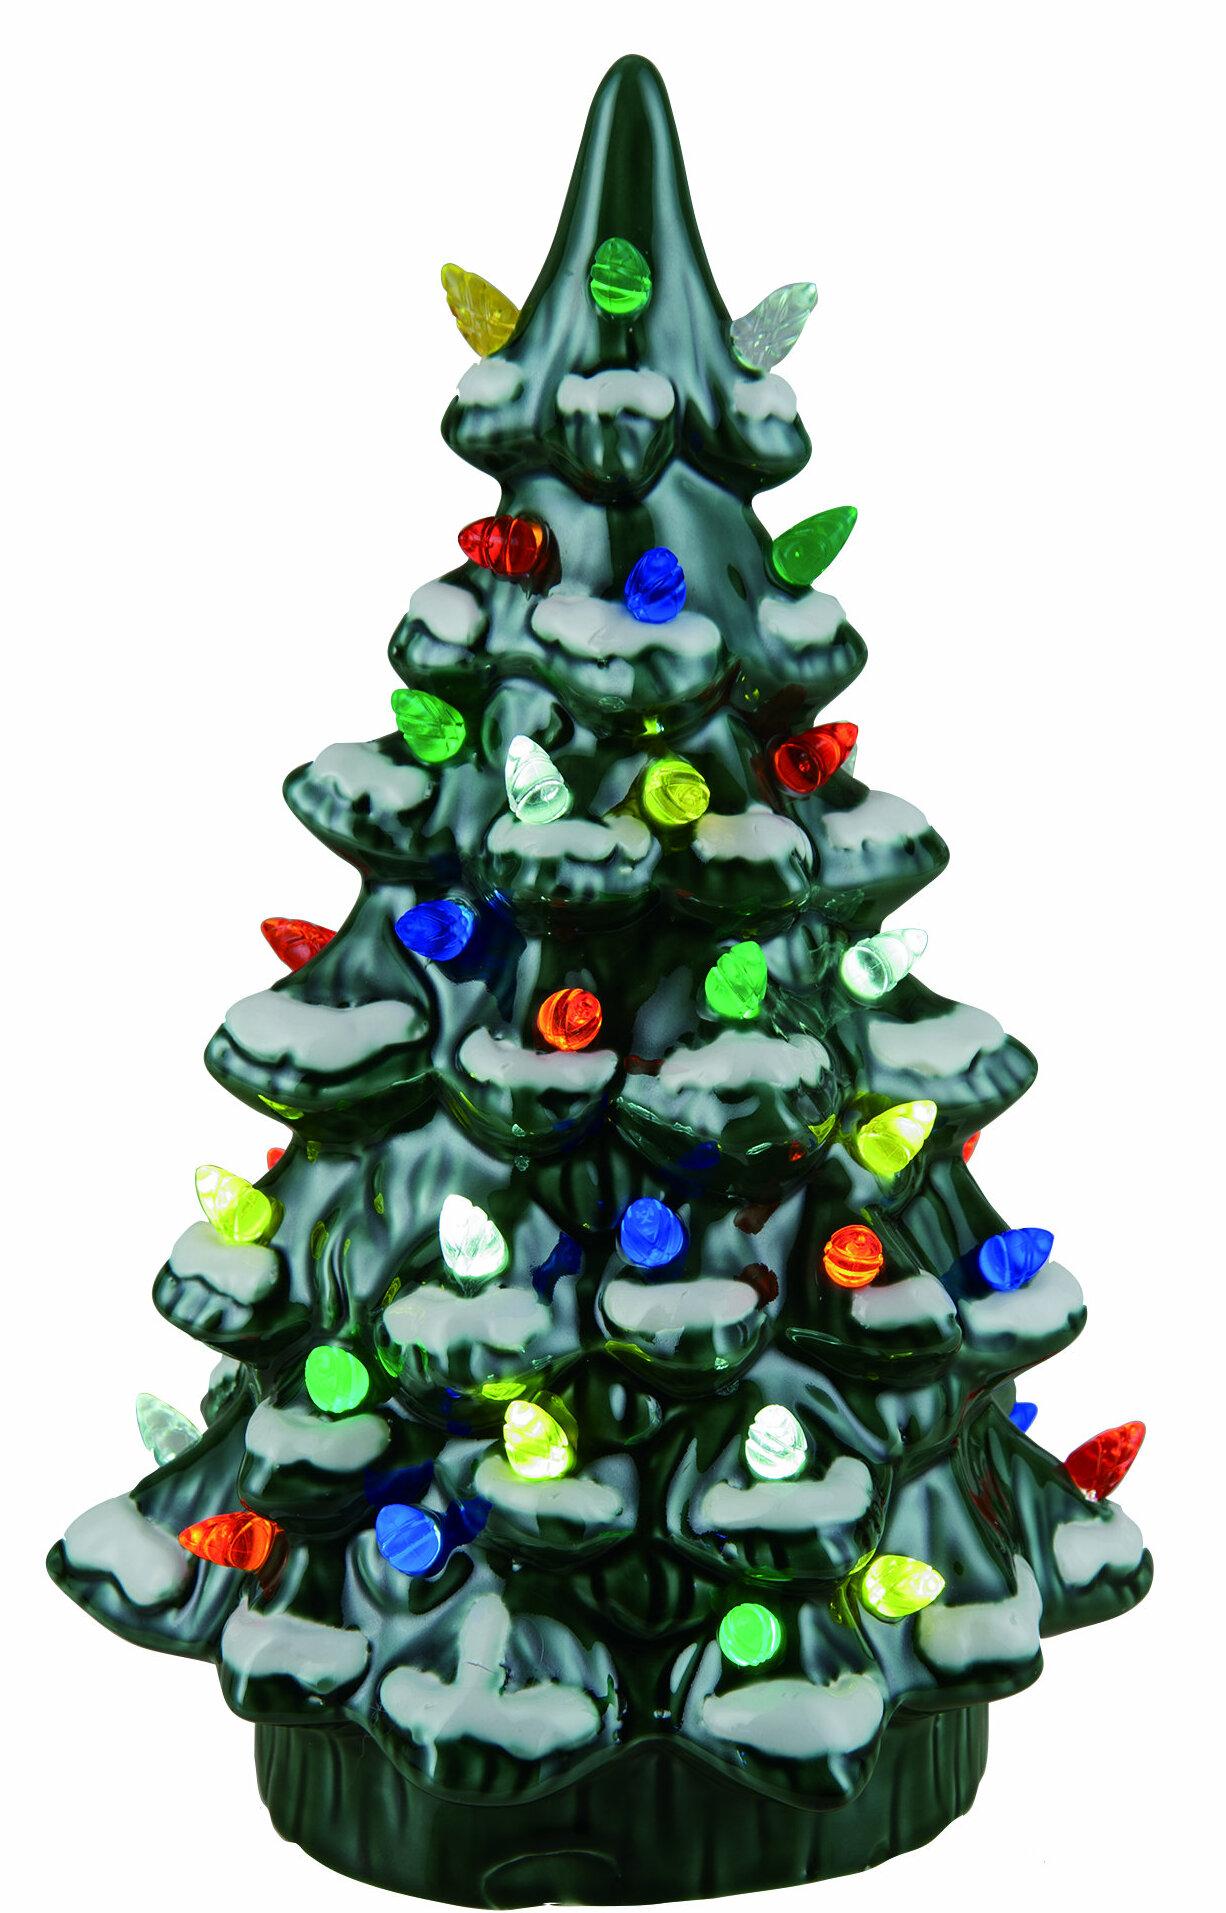 the holiday aisle walter ceramic light up nostalgic tree wayfair - Ceramic Light Up Christmas Tree